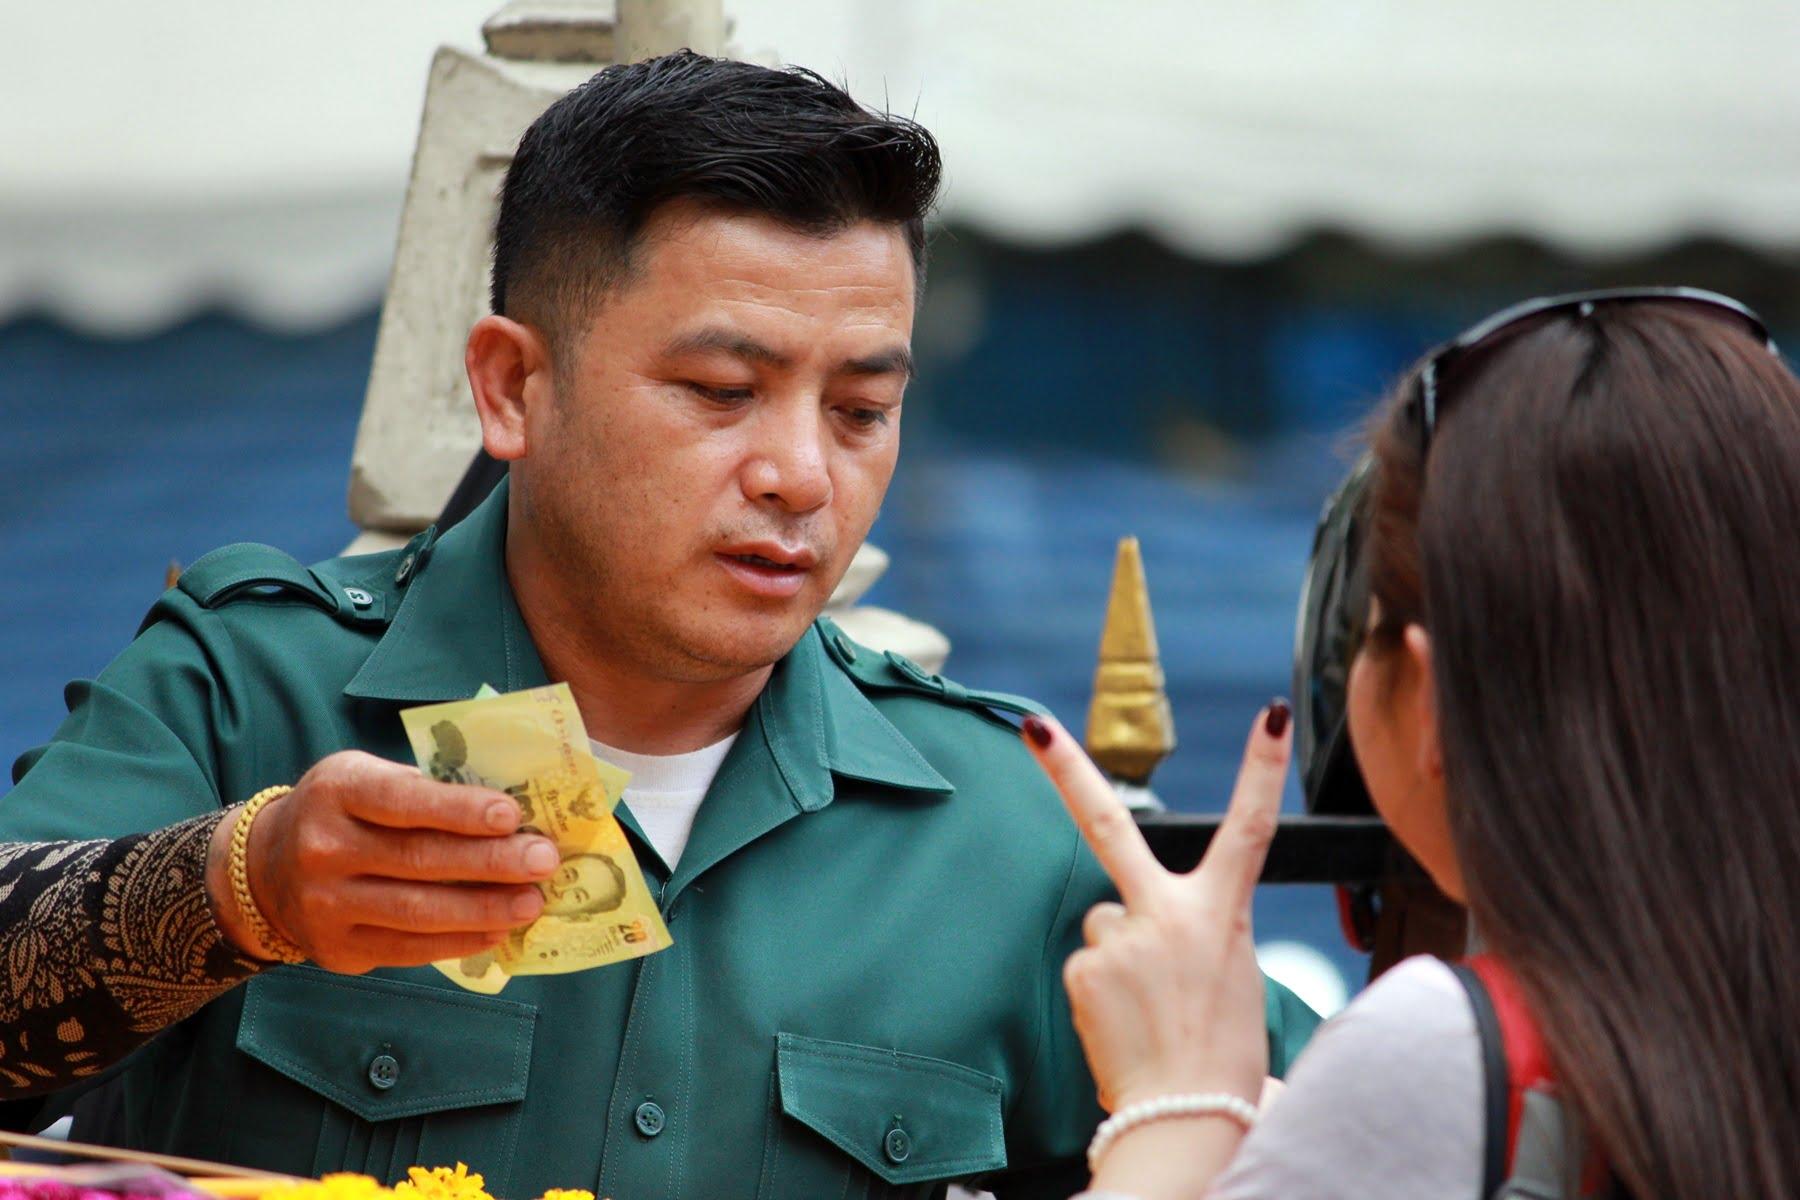 Memenuhi Janji Liburan ke Bangkok Bareng Mama Lebaran 2019